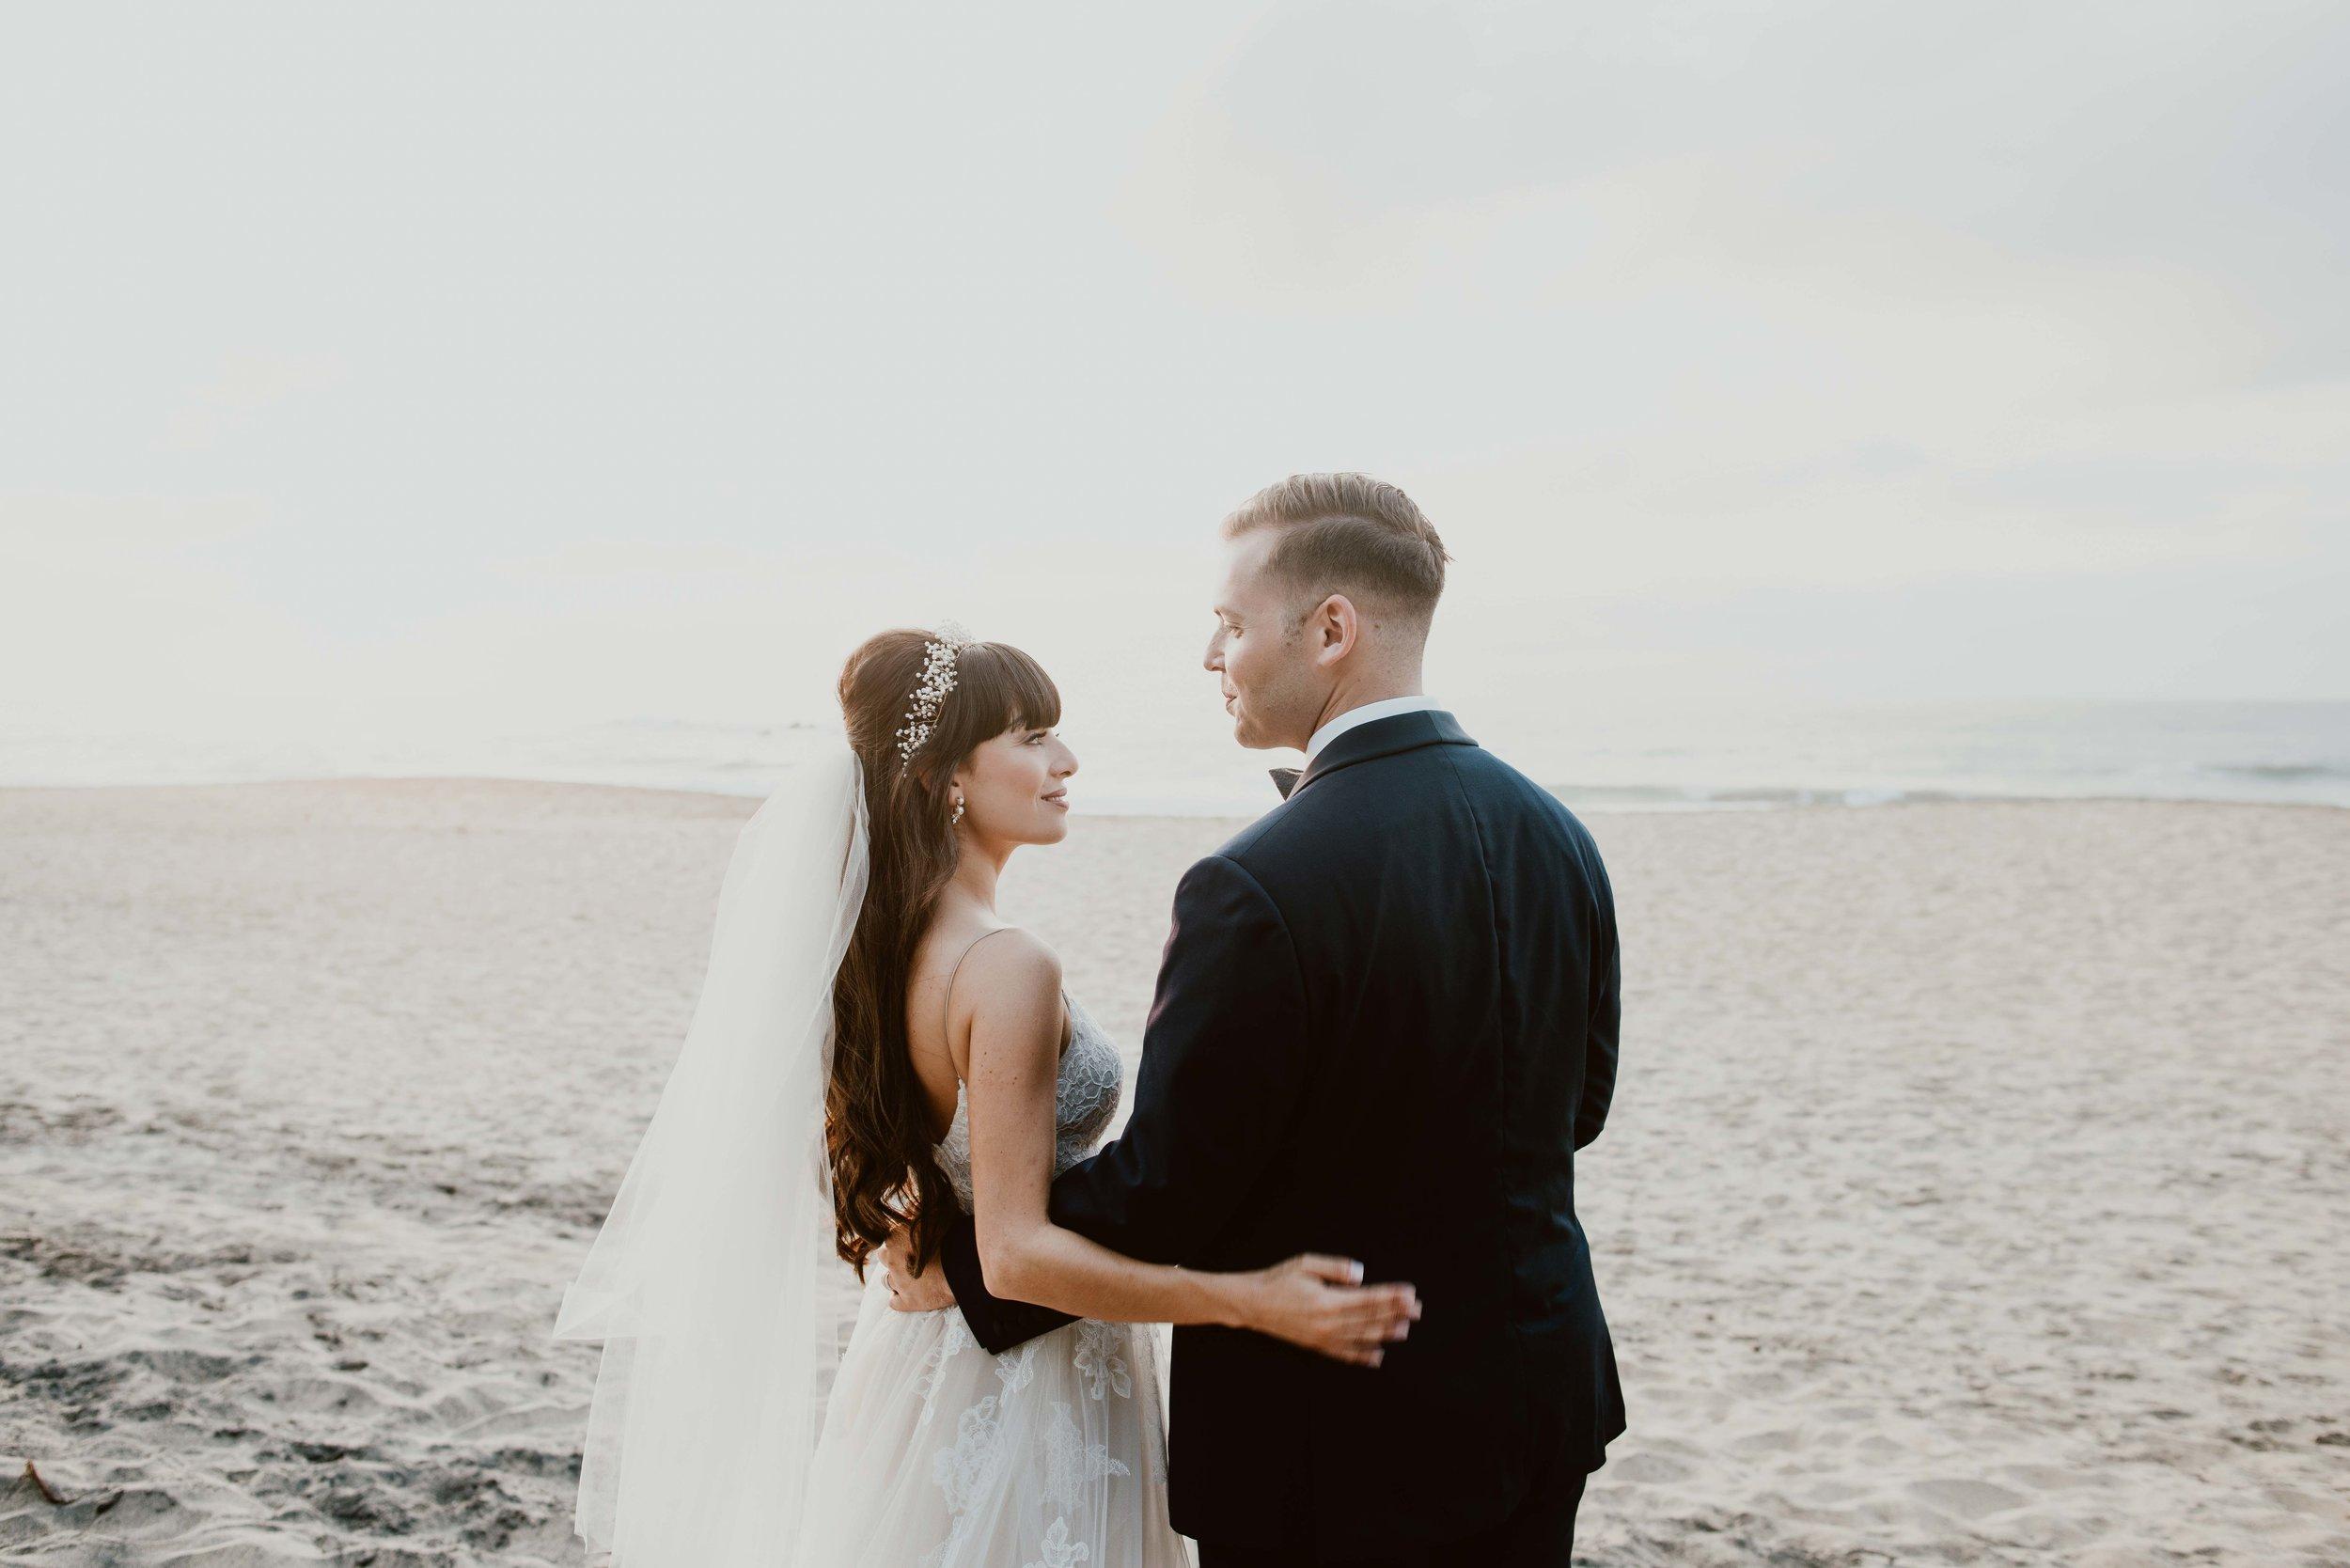 Mariana+Blake Sayulita Wedding-361.jpg